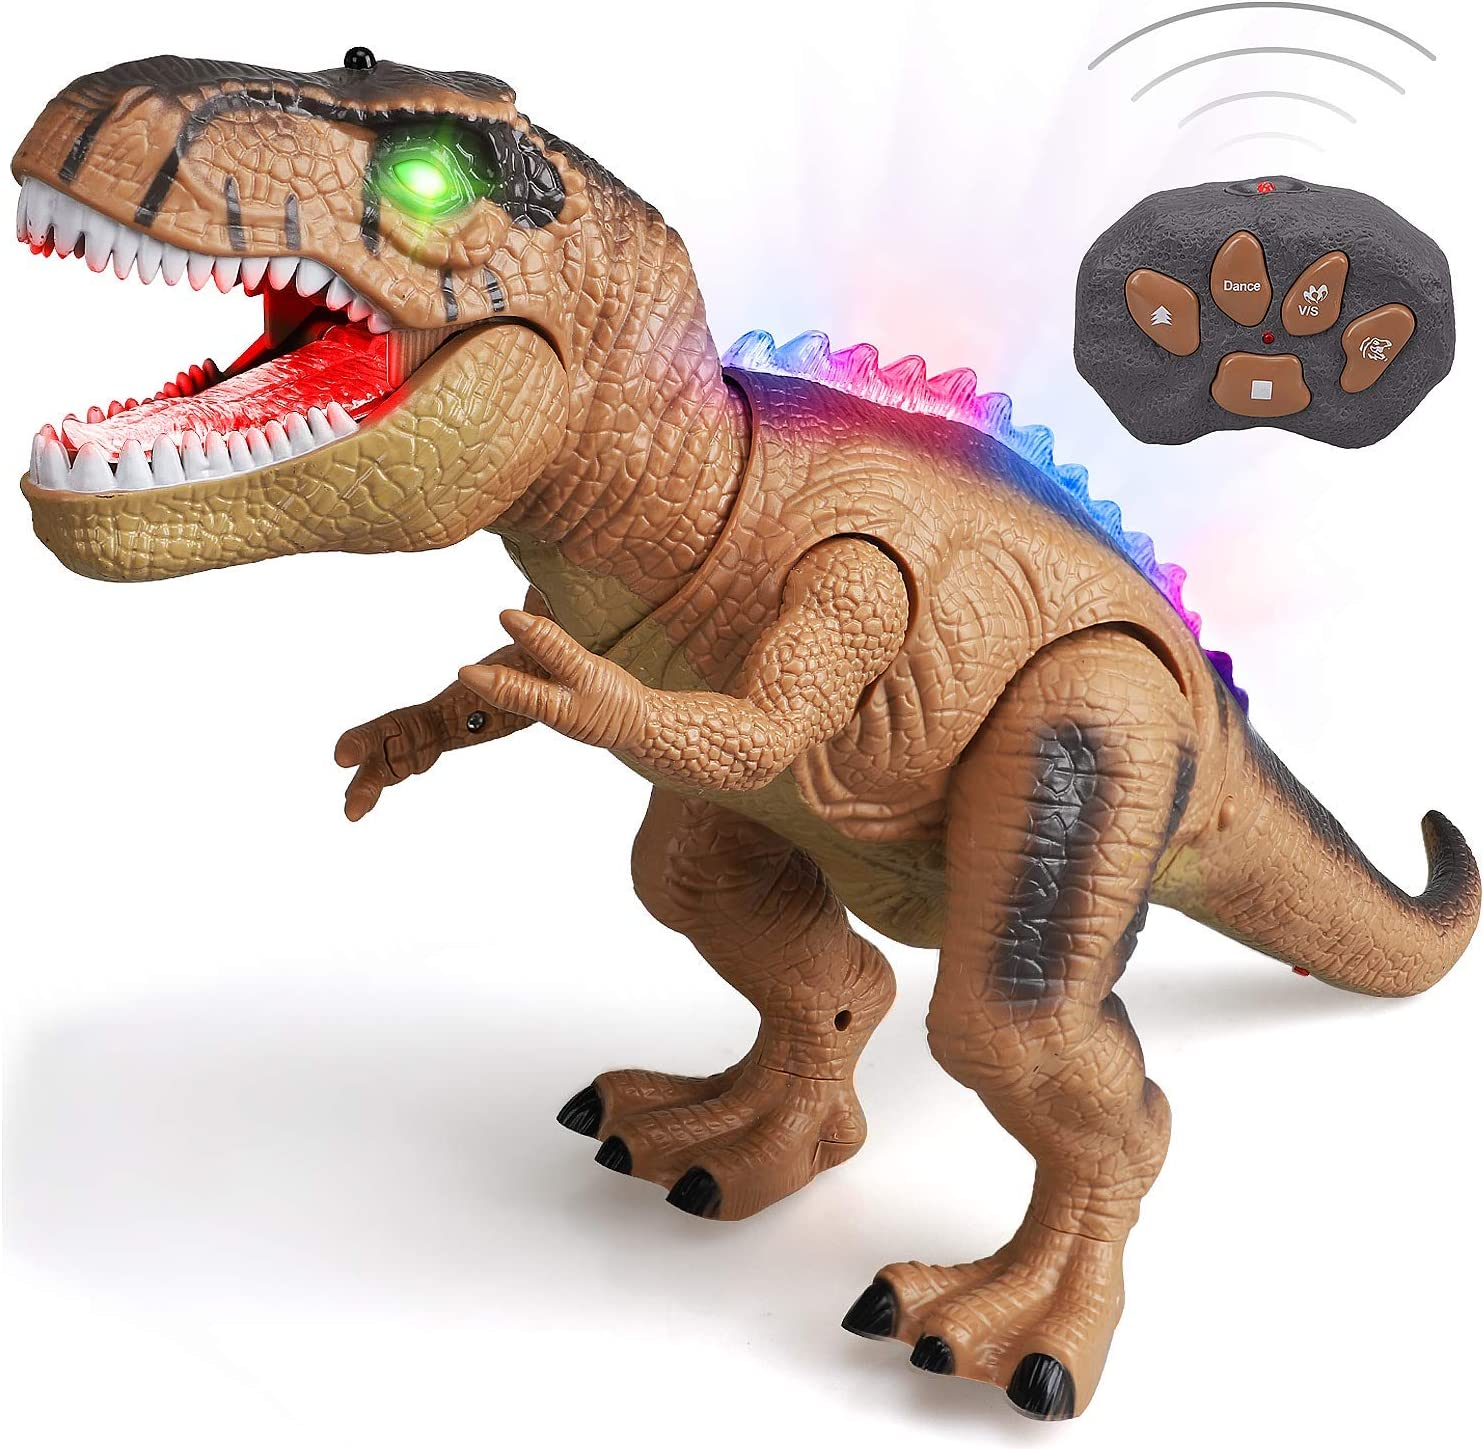 T rex Dinosaur Toys for Boys STEAM Life Remote Control Dinosaur Toys for Kids Light Up /& Realistic Roaring Sound Dinosaur Robot Toy for Kids Boys Girls 3 4 5 6 7 Walking Dinosaur Toys Brown